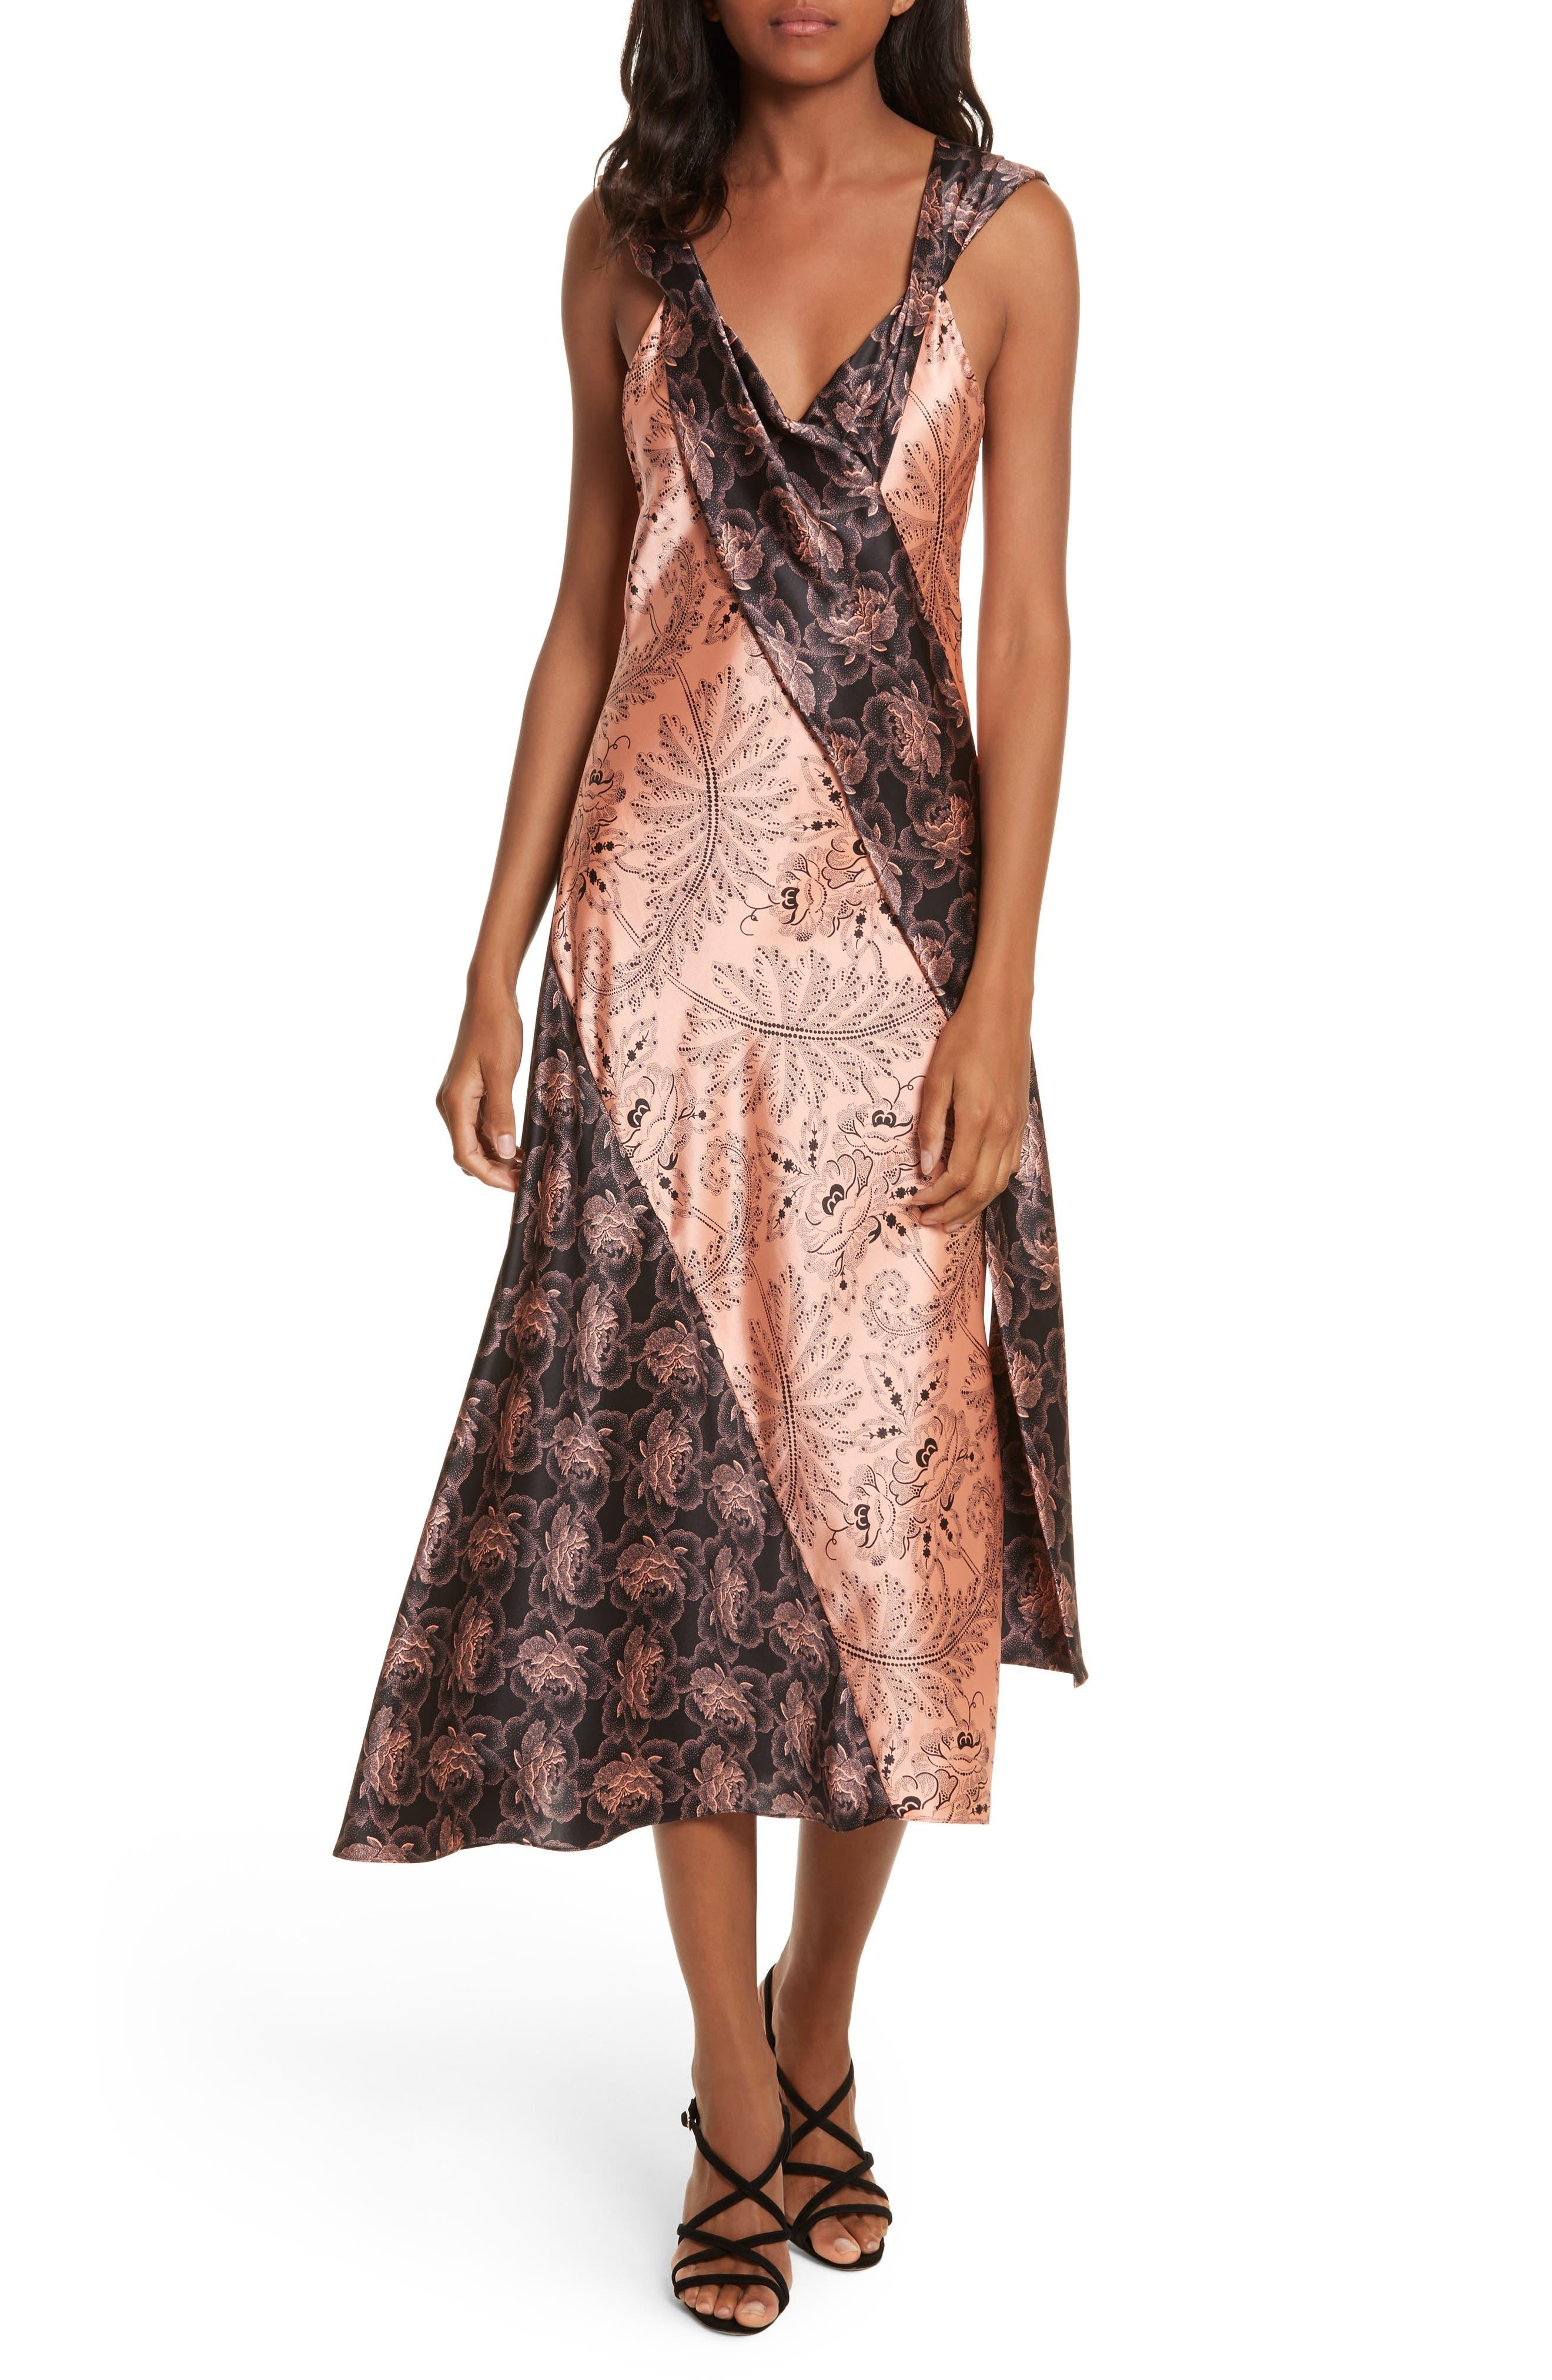 Diane von Furstenberg Draped Mixed Floral Midi Dress,                             Main thumbnail 1, color,                             654